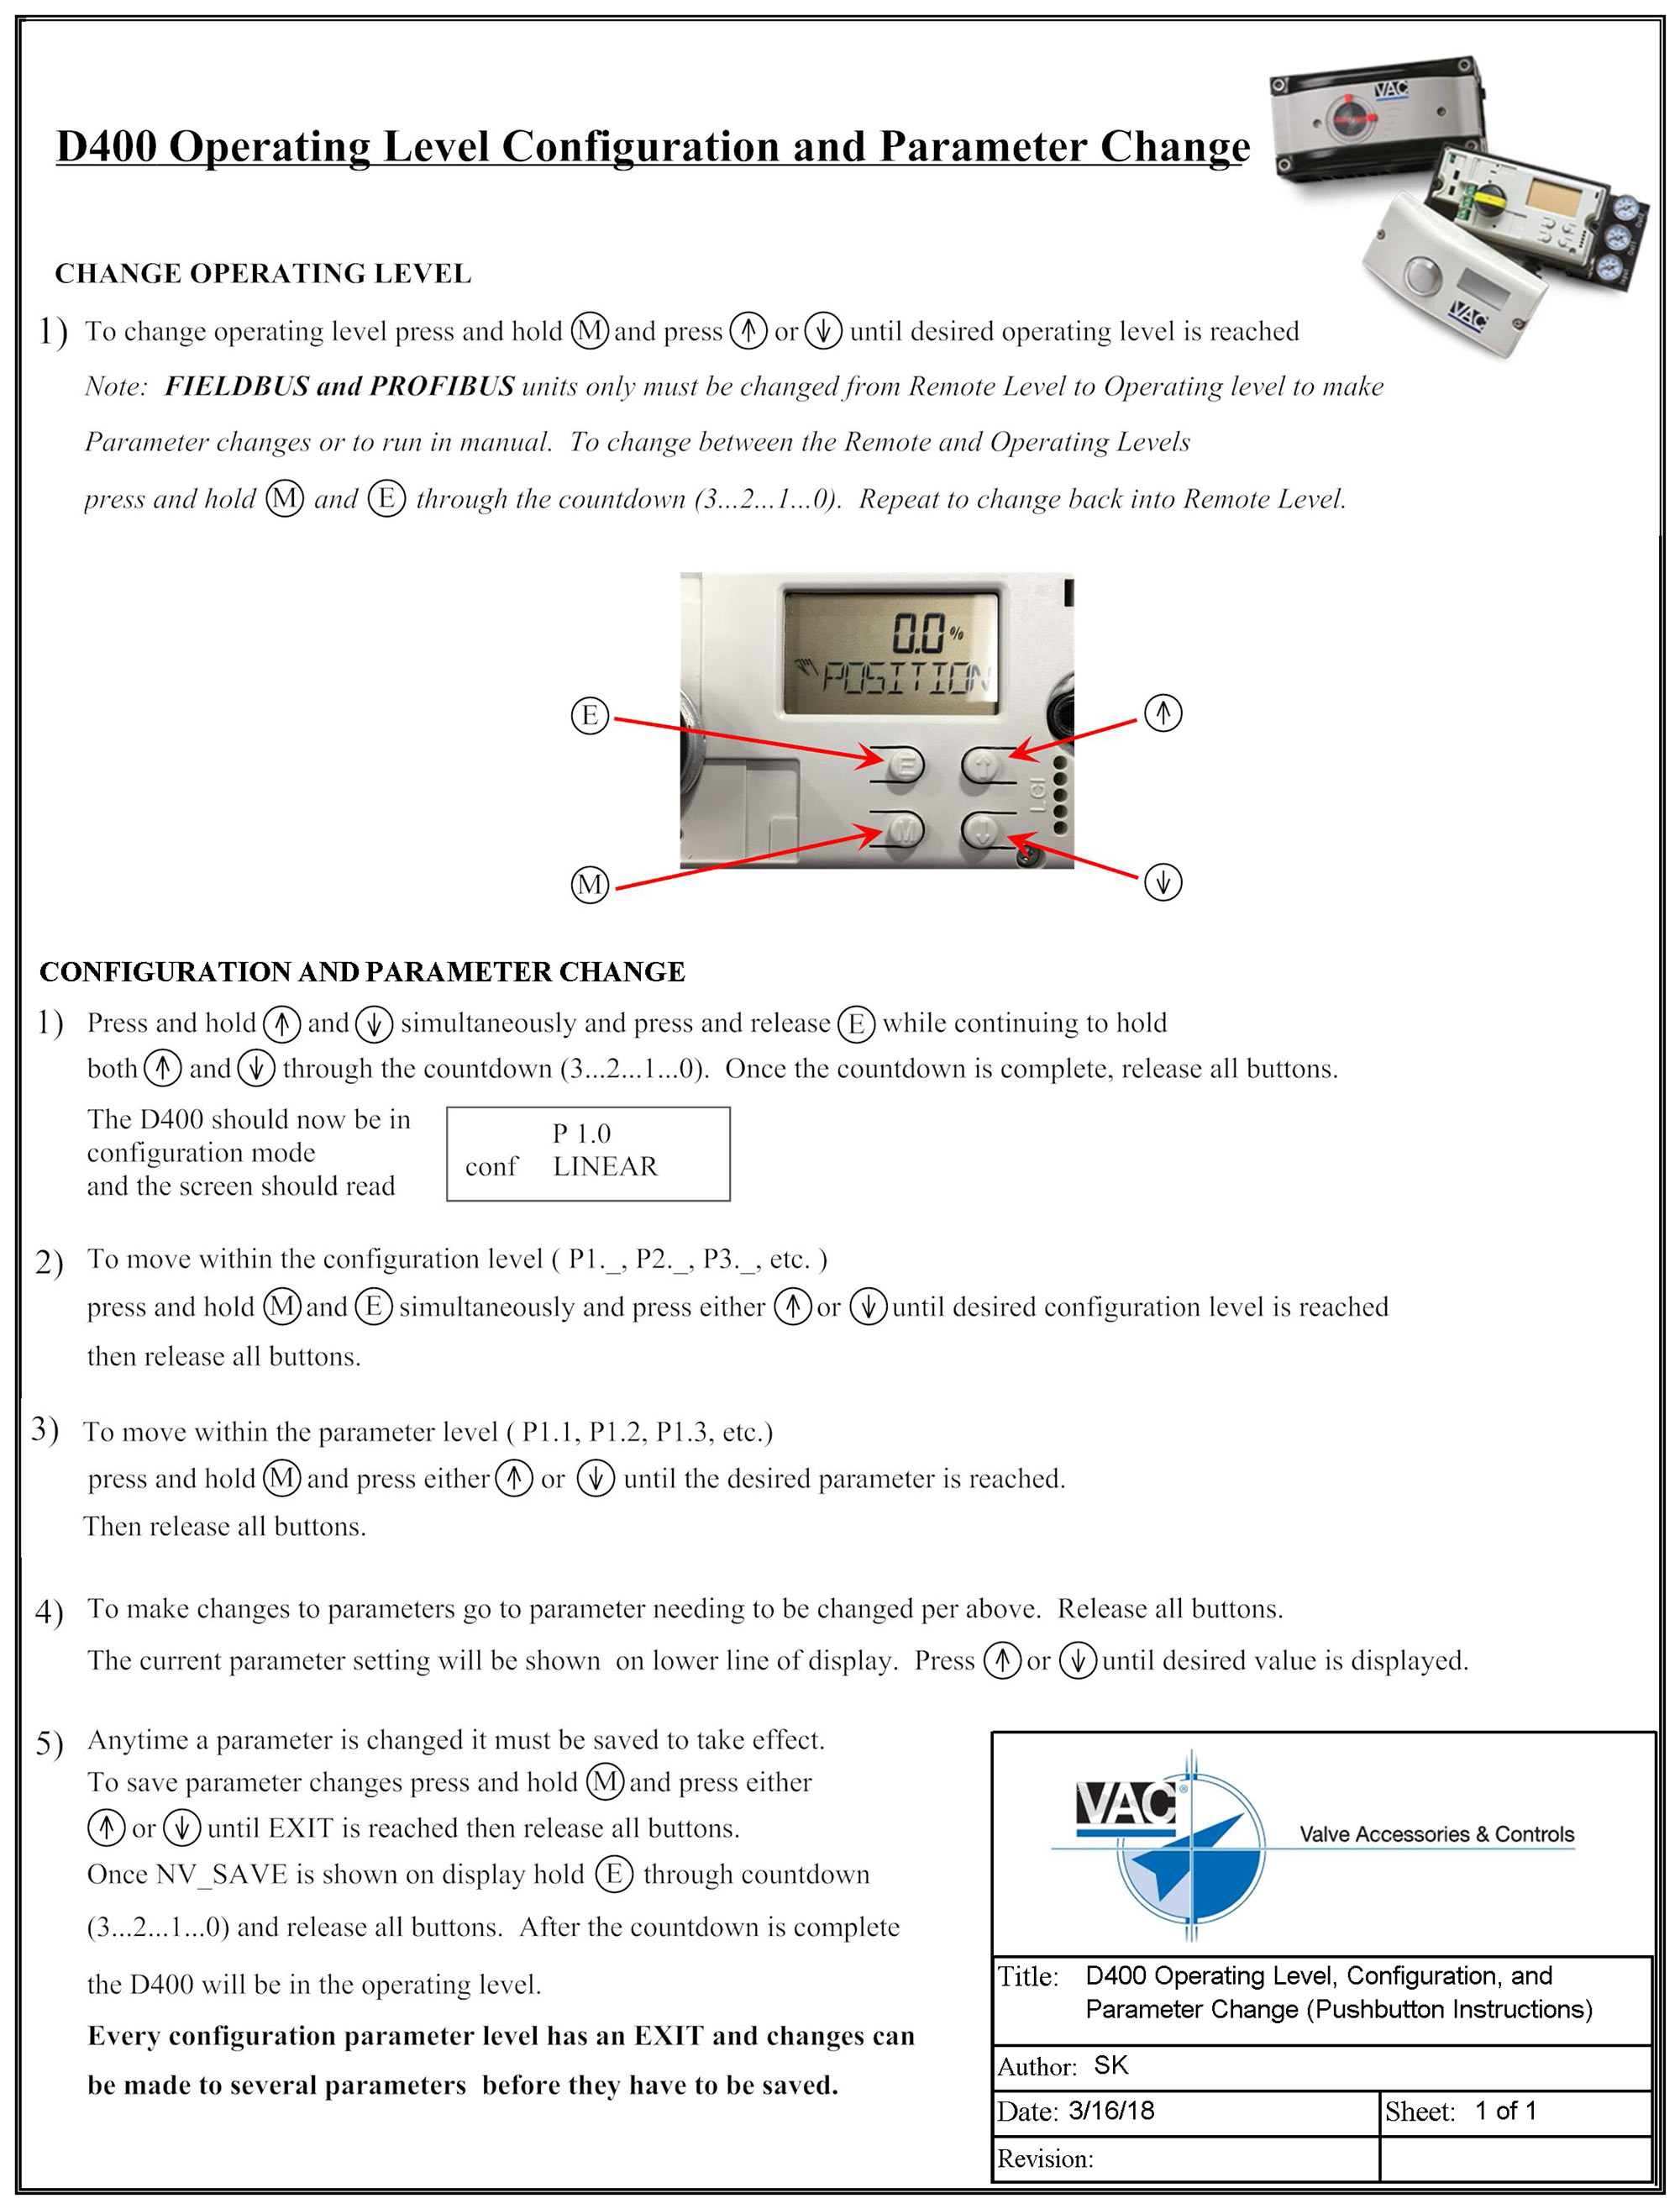 D400 Pushbutton Instructions